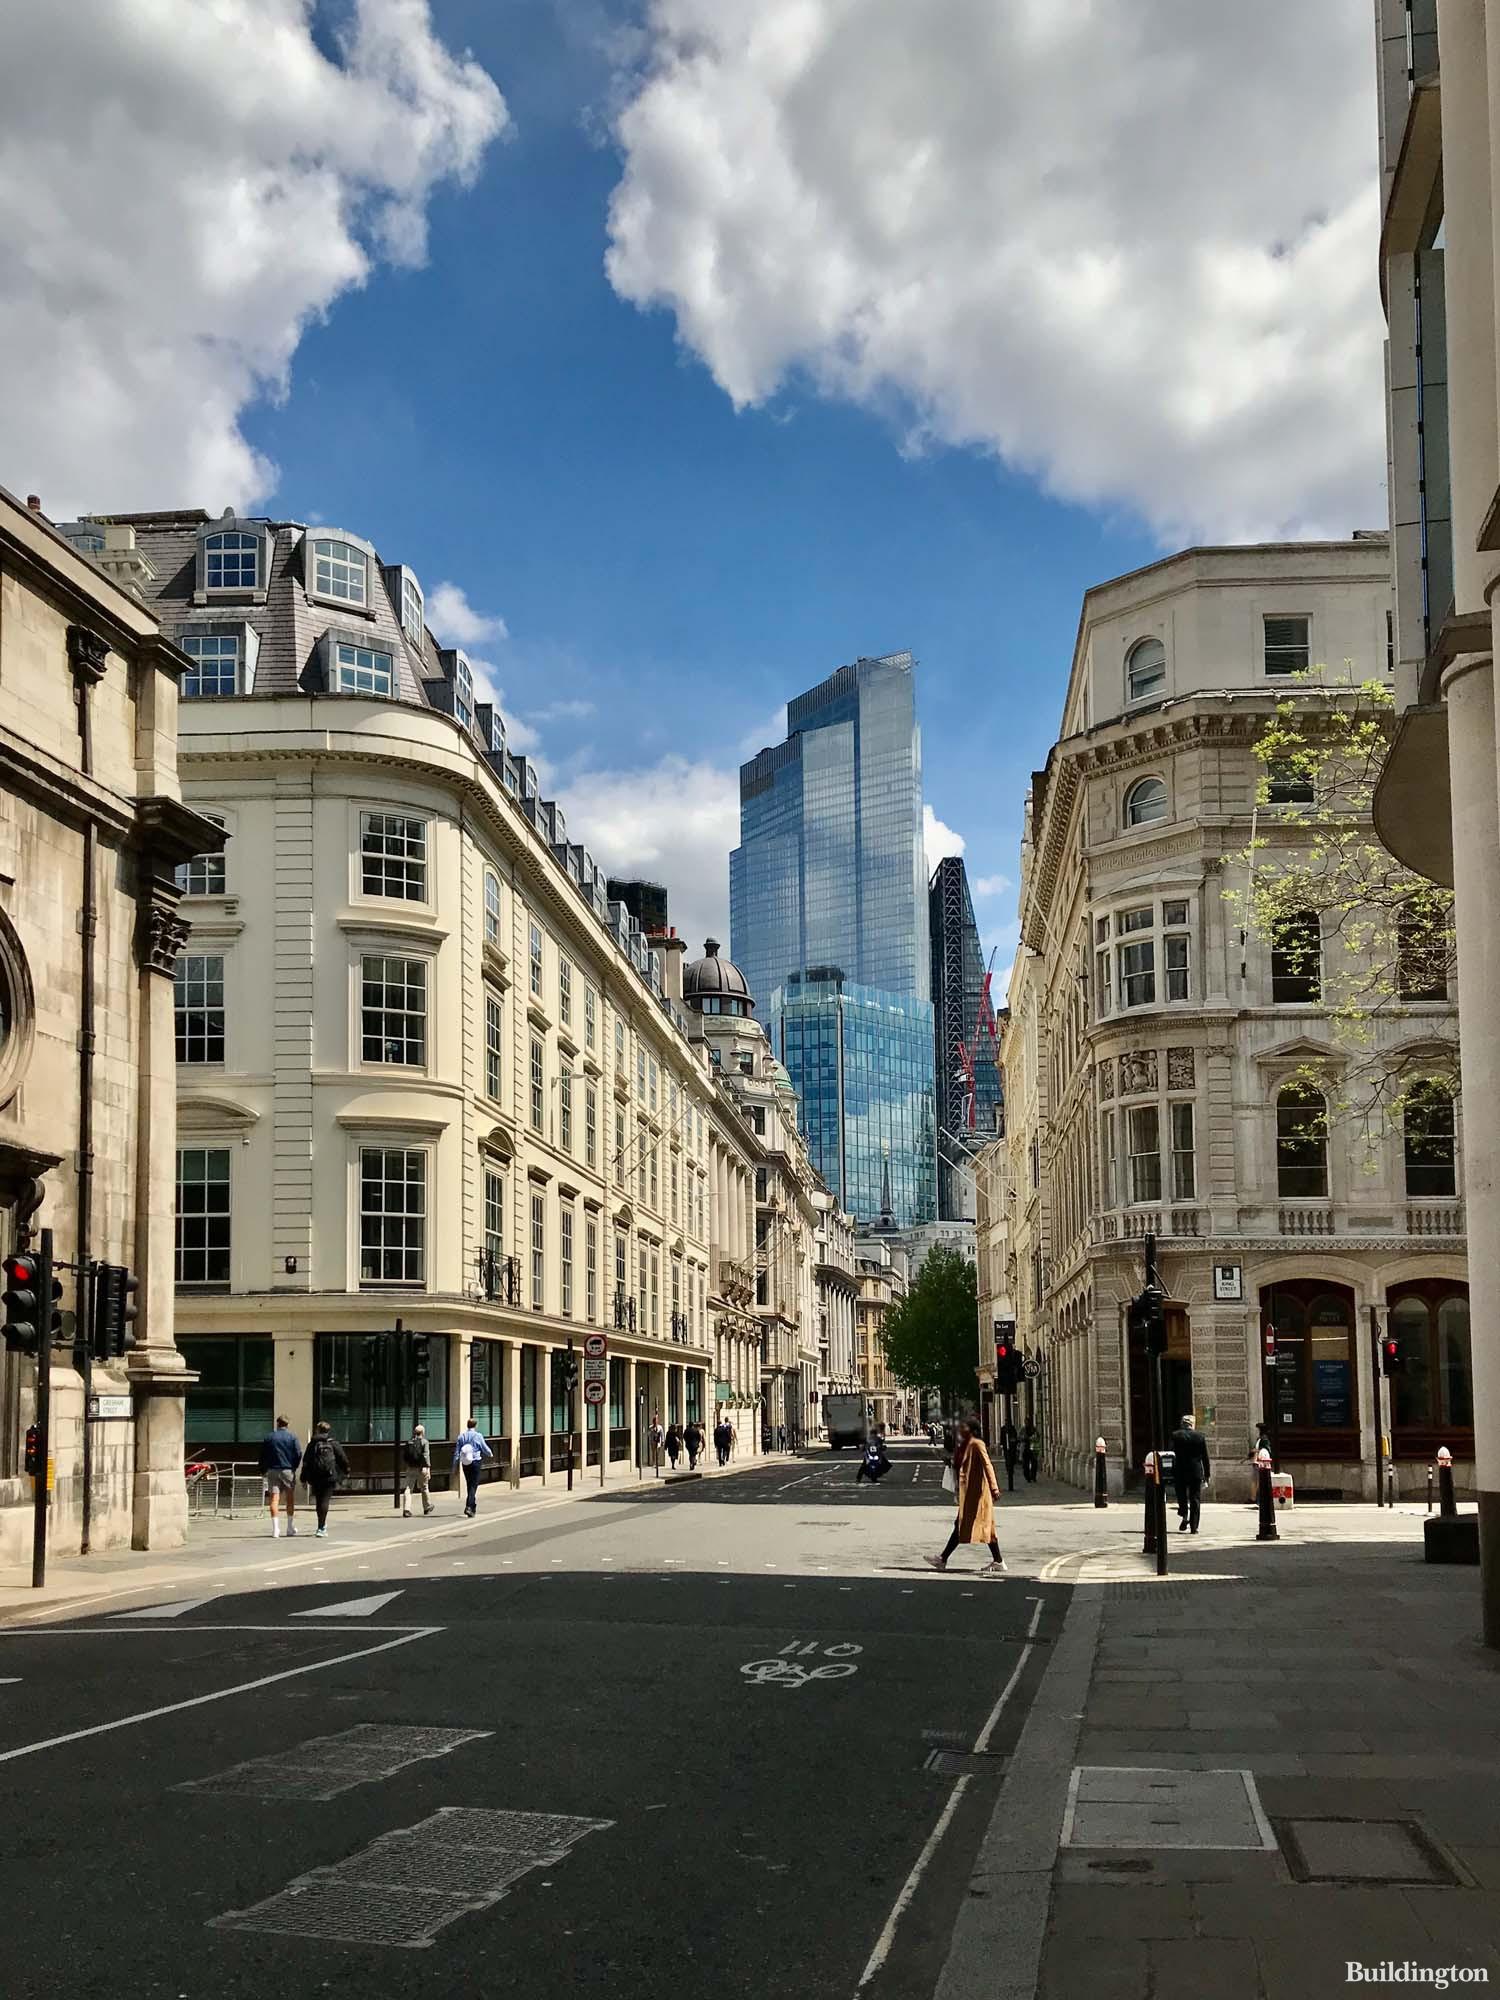 85 Gresham Street building oppositte 20 King Street in the City of London EC2. 22 Bishopsgate in the background.